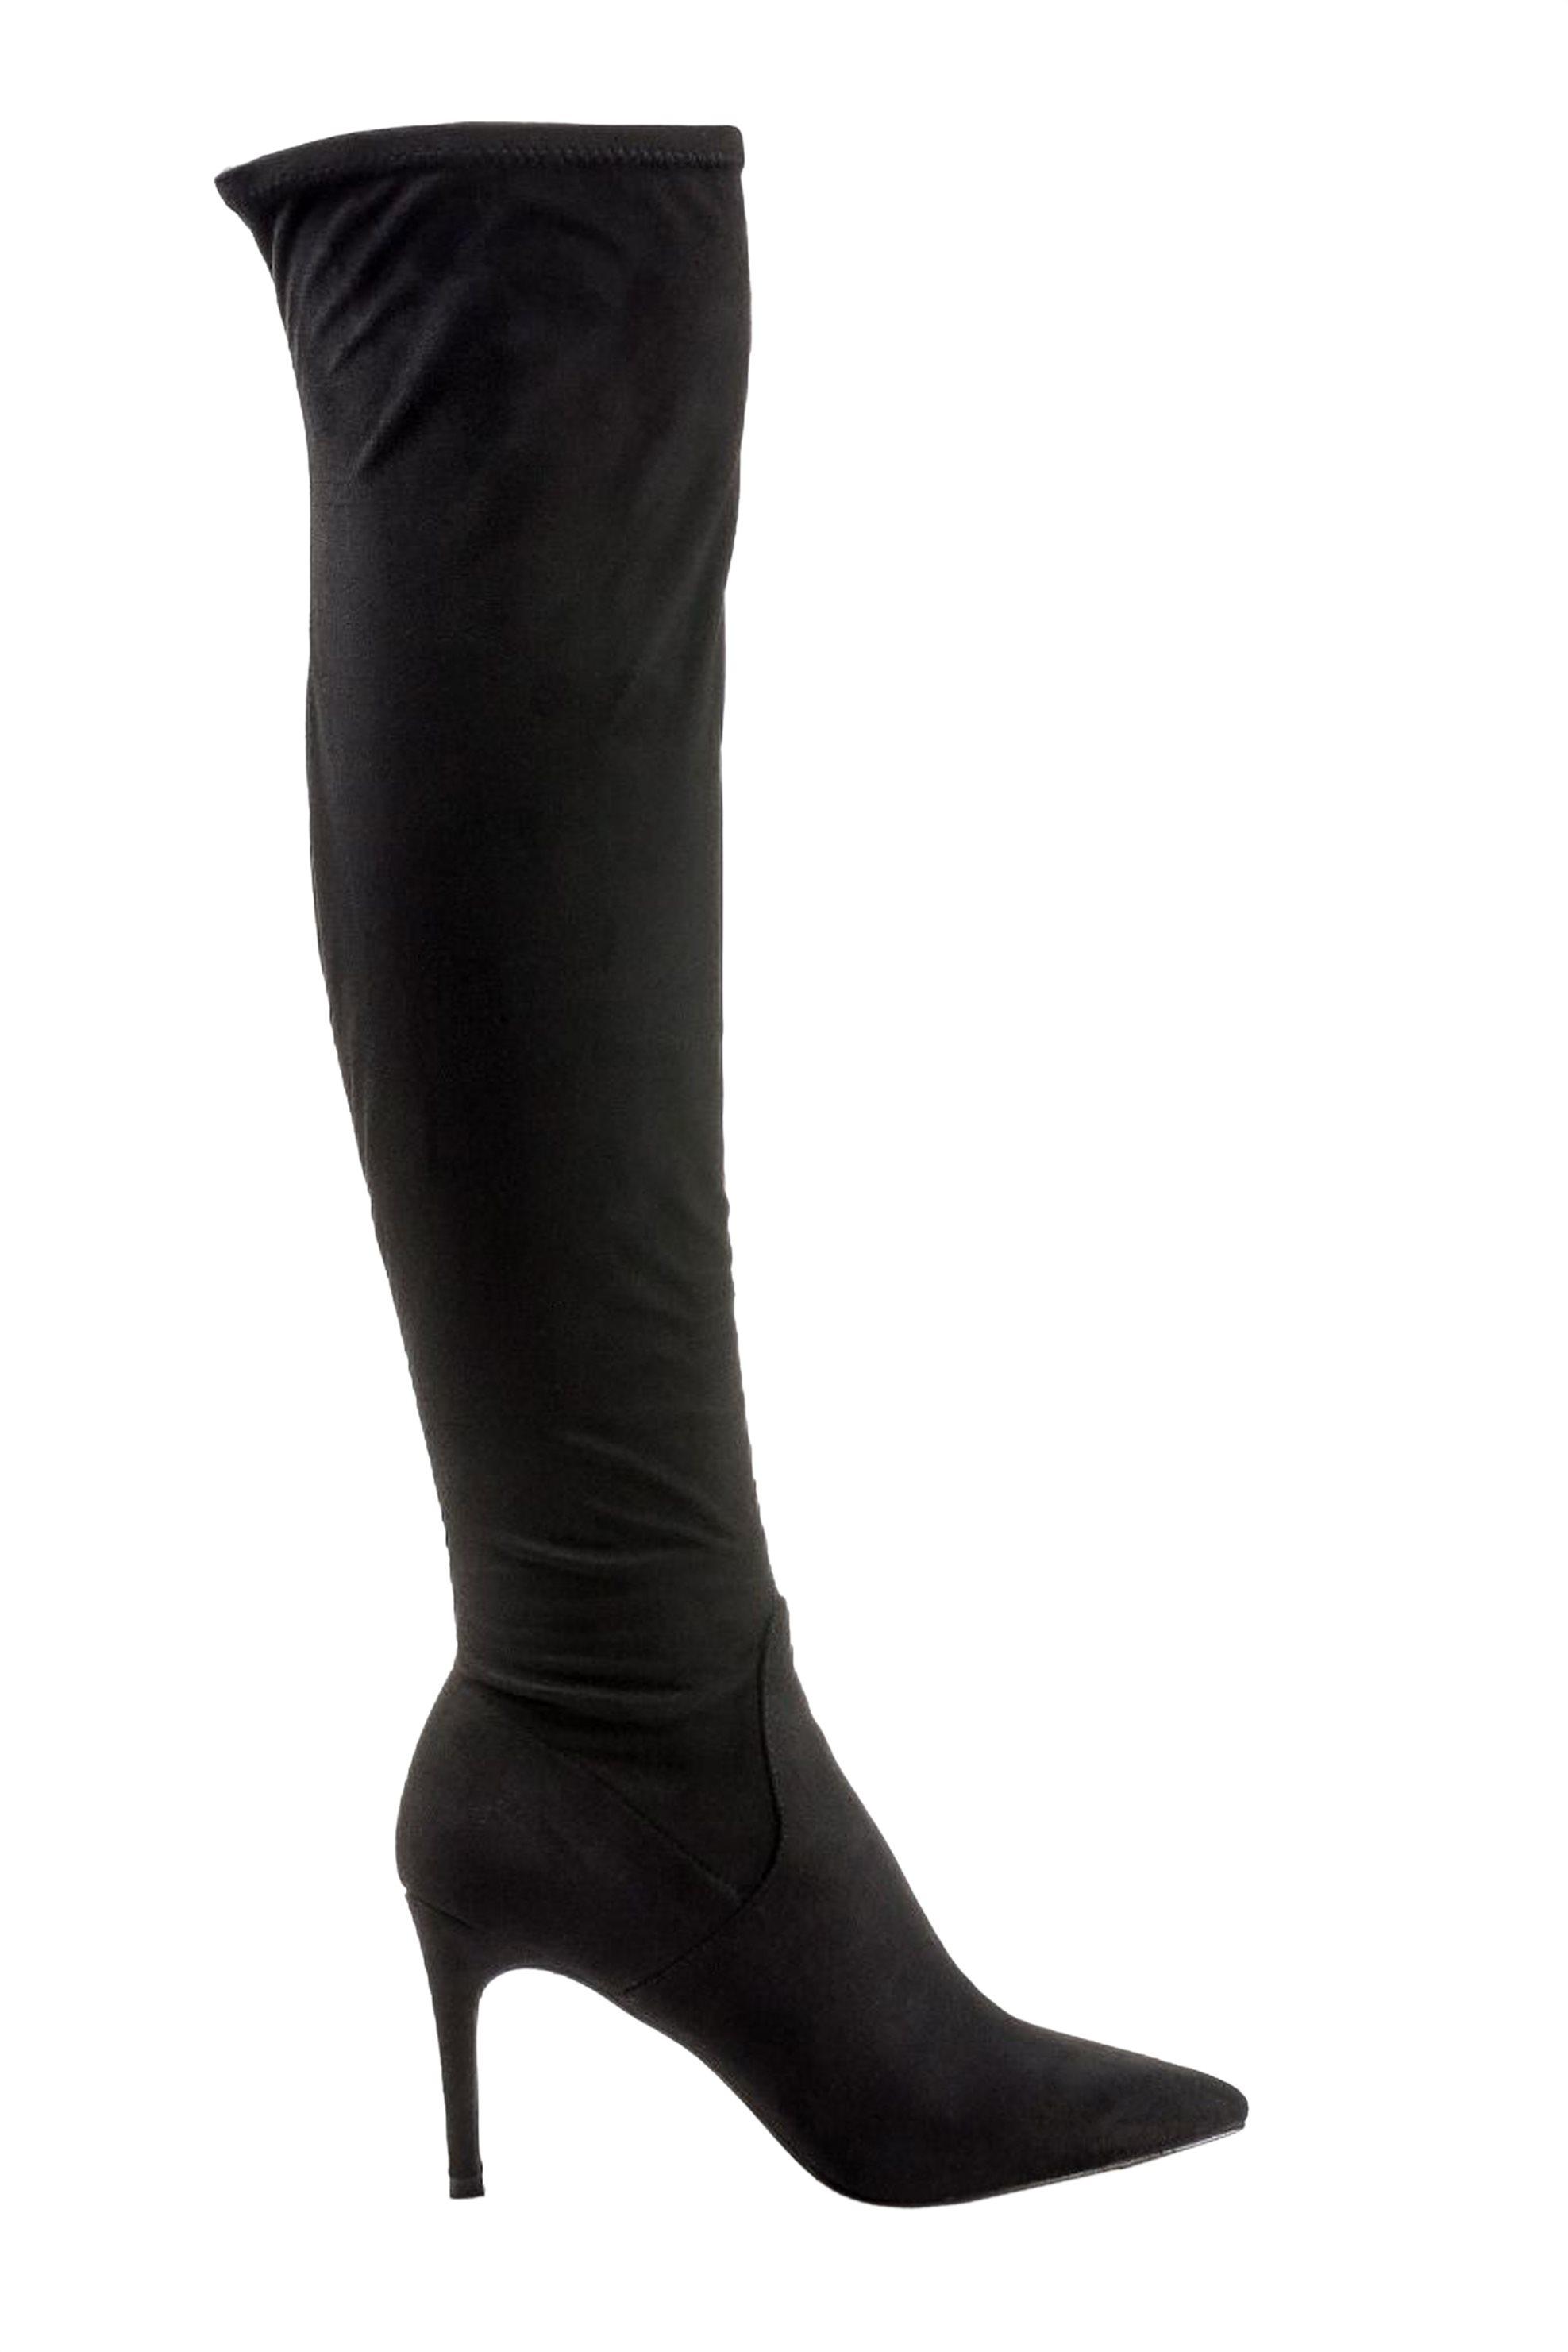 Steve Madden γυναικεία μποτά over the knee LACIE - 218744-LACIE - Μαύρο γυναικα   παπουτσια   μπότες   πάνω από το γόνατο